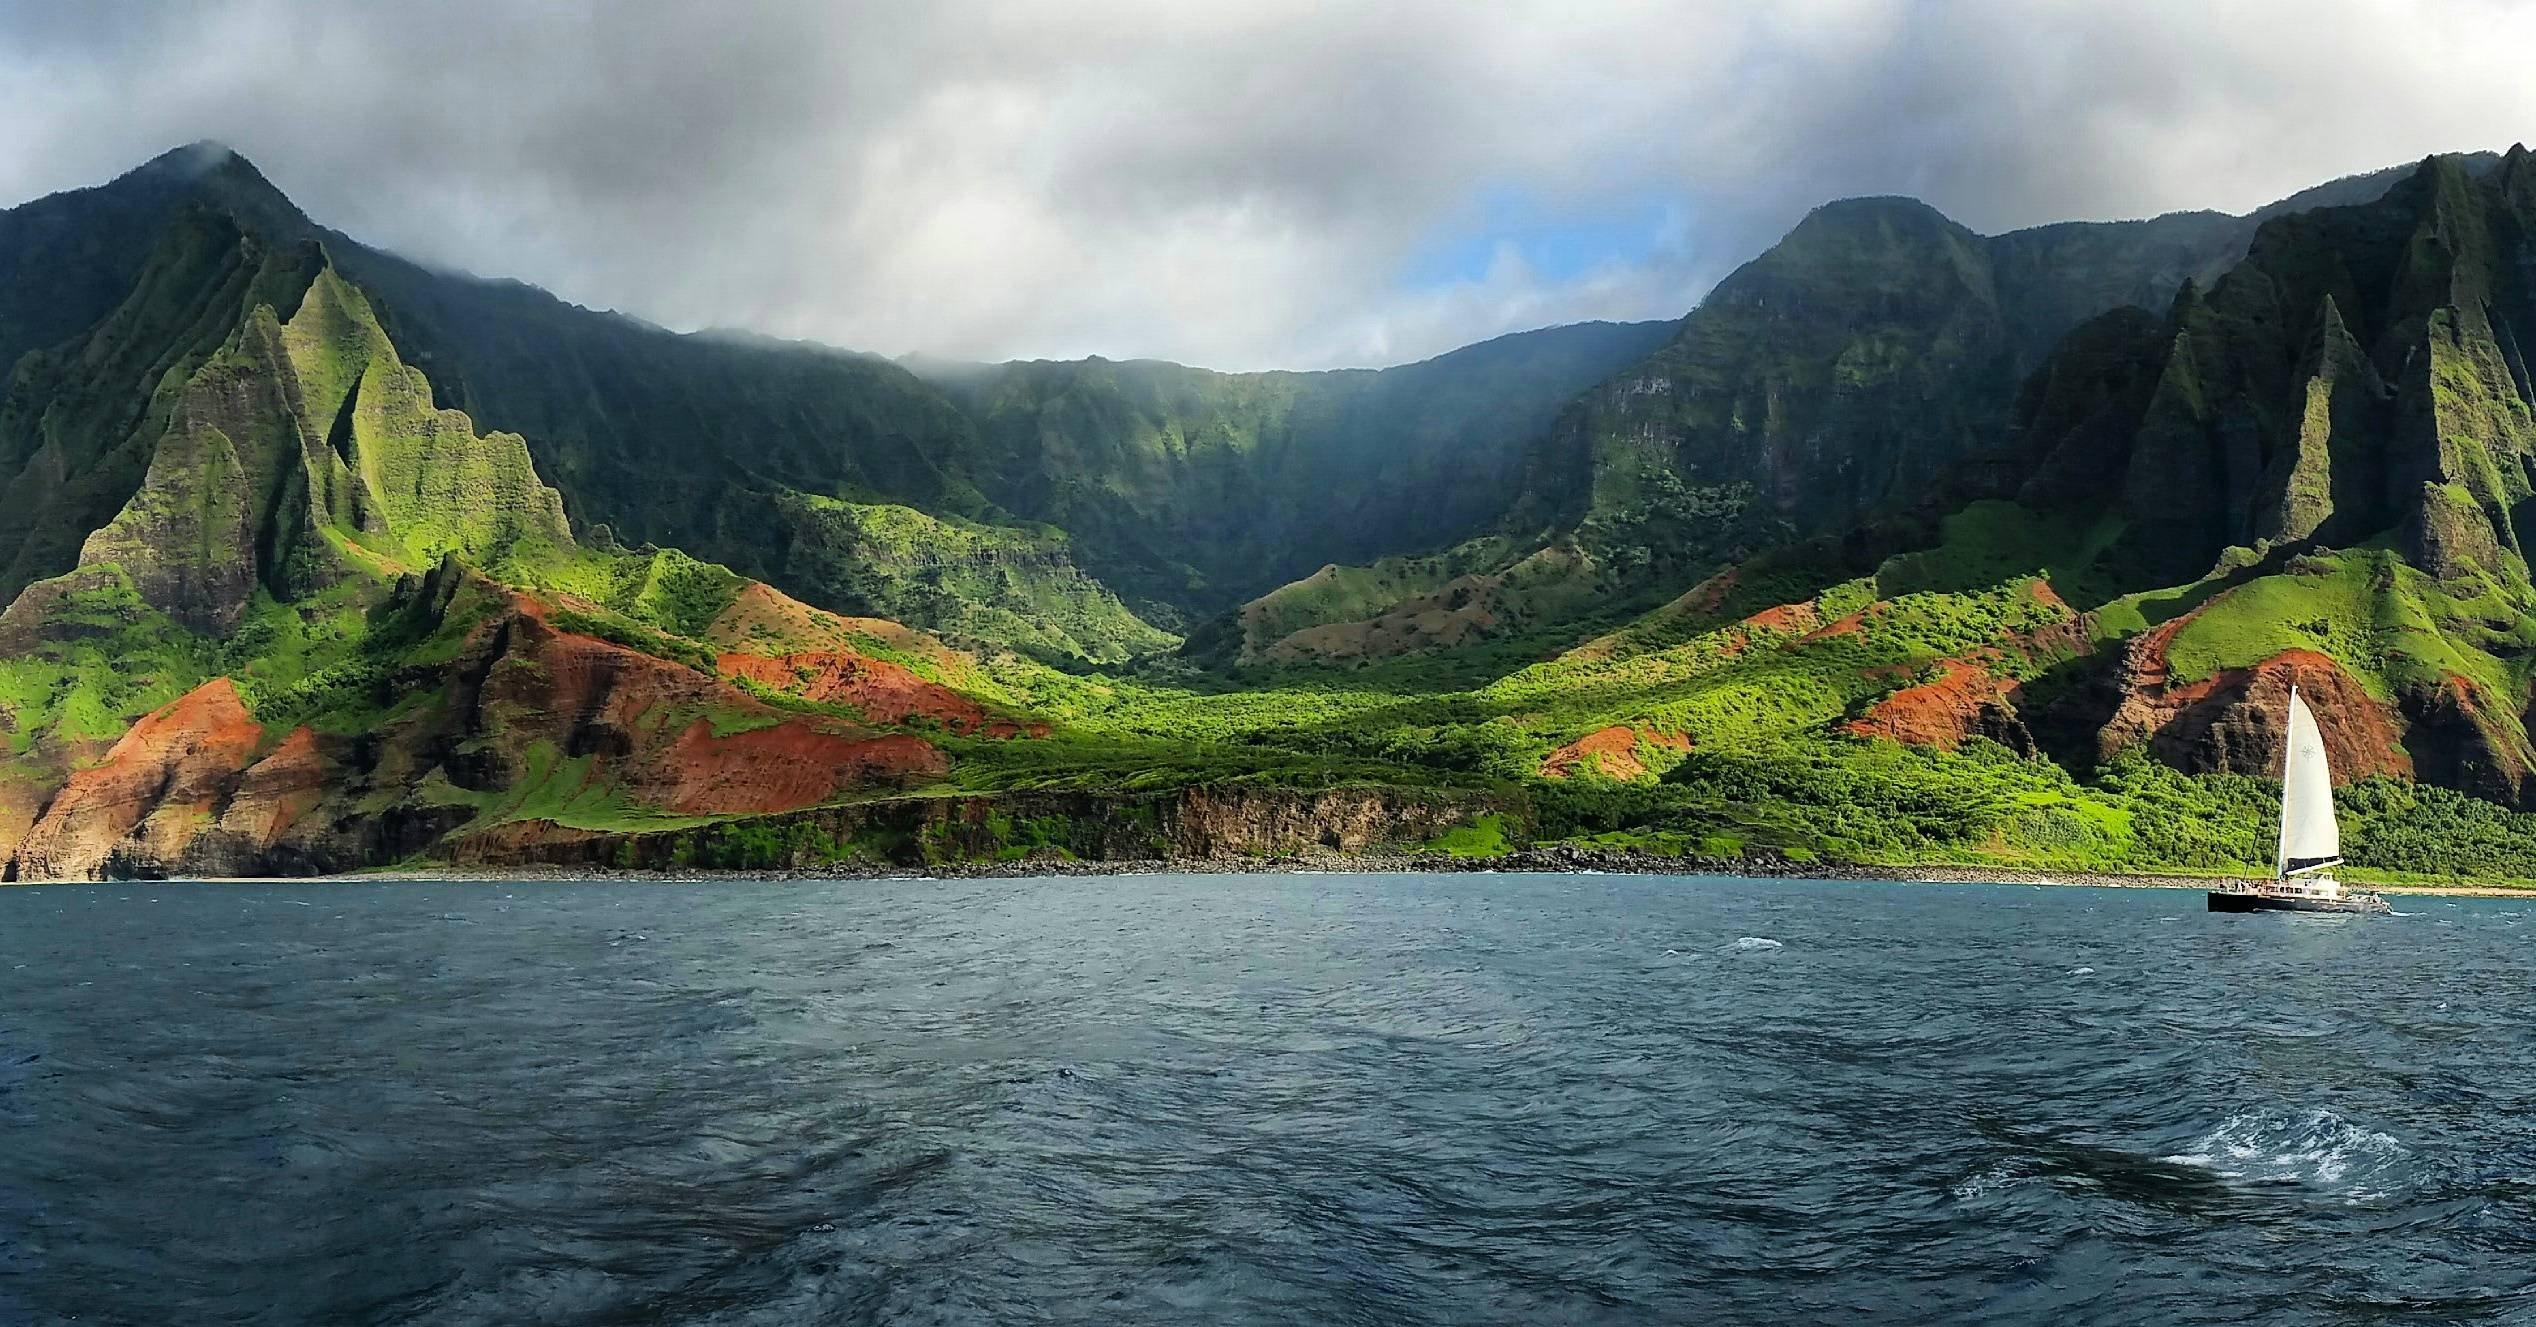 Lg Optimus Wallpaper Hd Napali Coast Kauai 14645 Hd Wallpaper